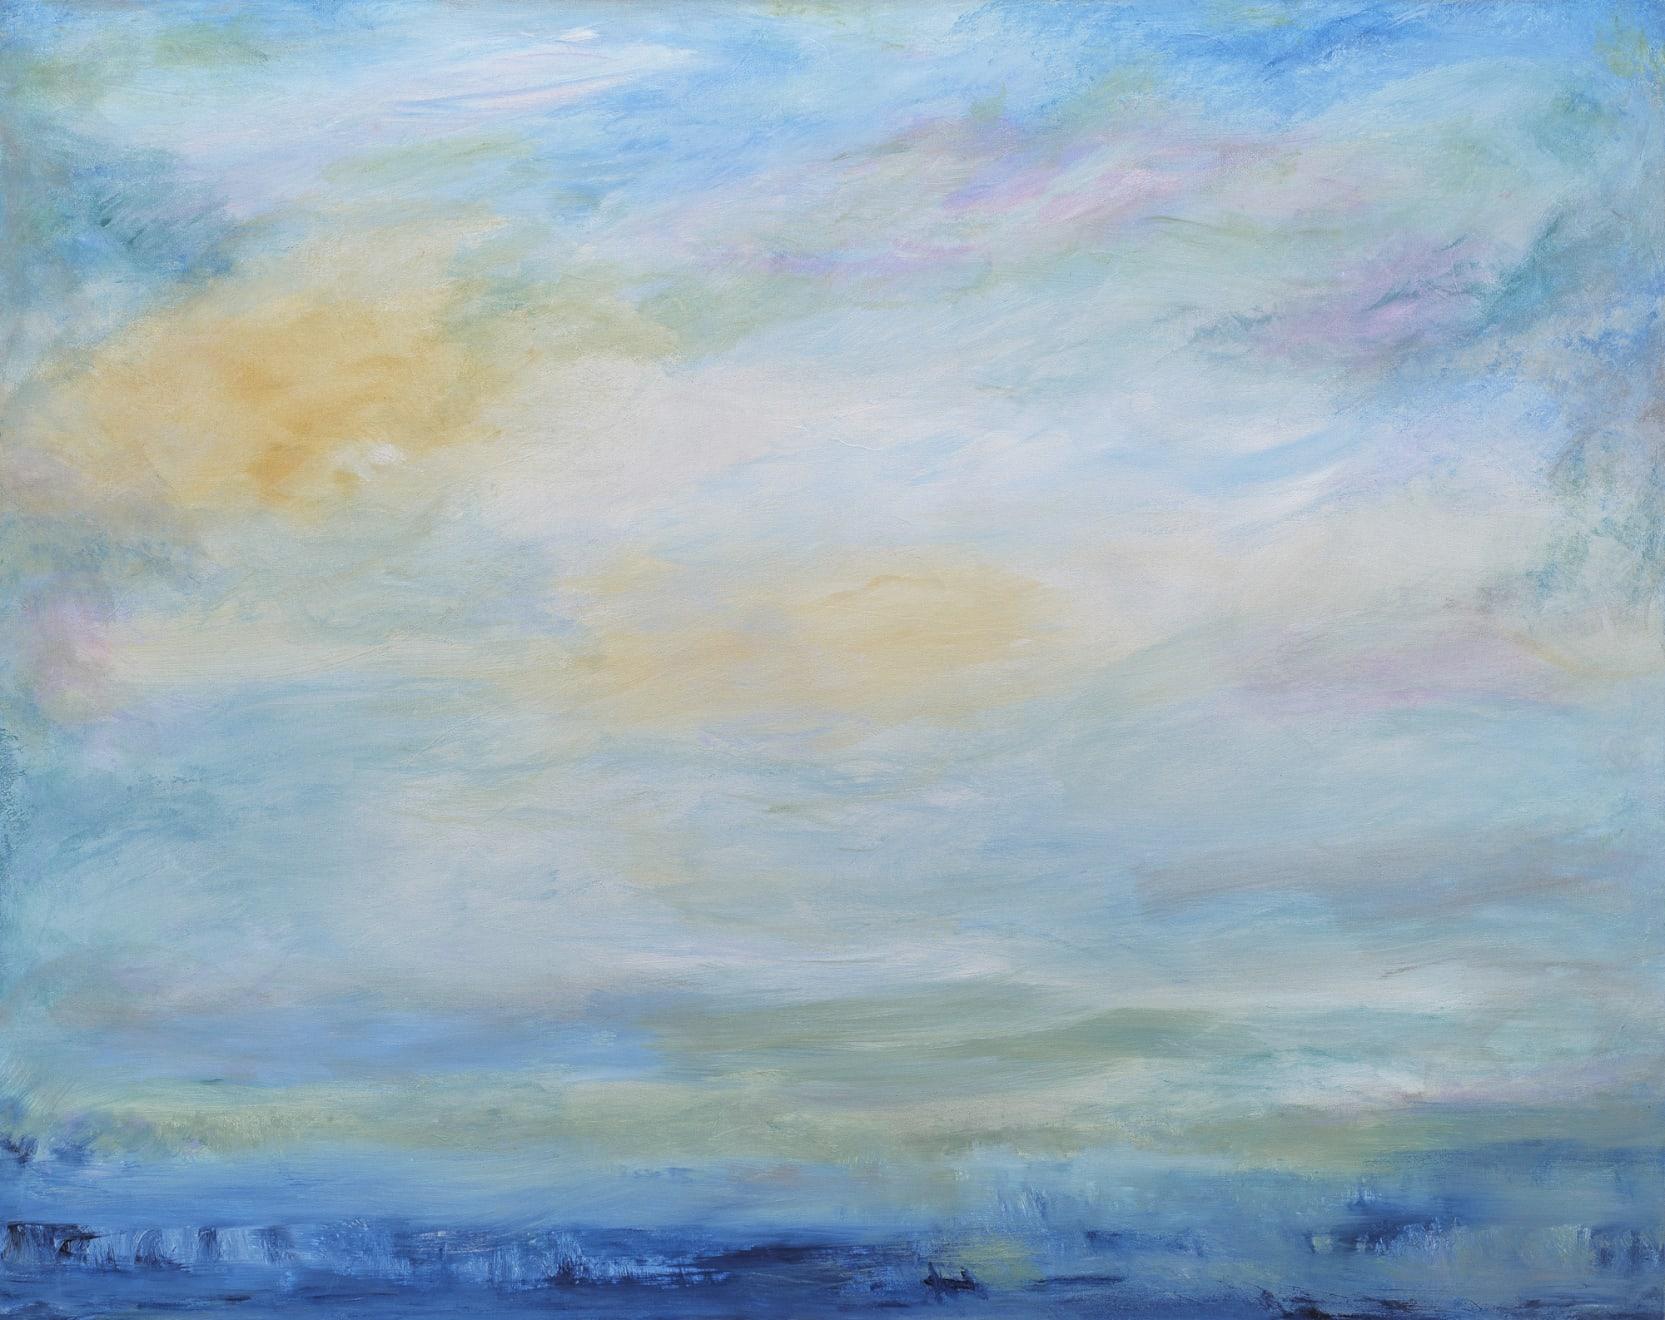 Patricia Qualls, Seascape, 2019